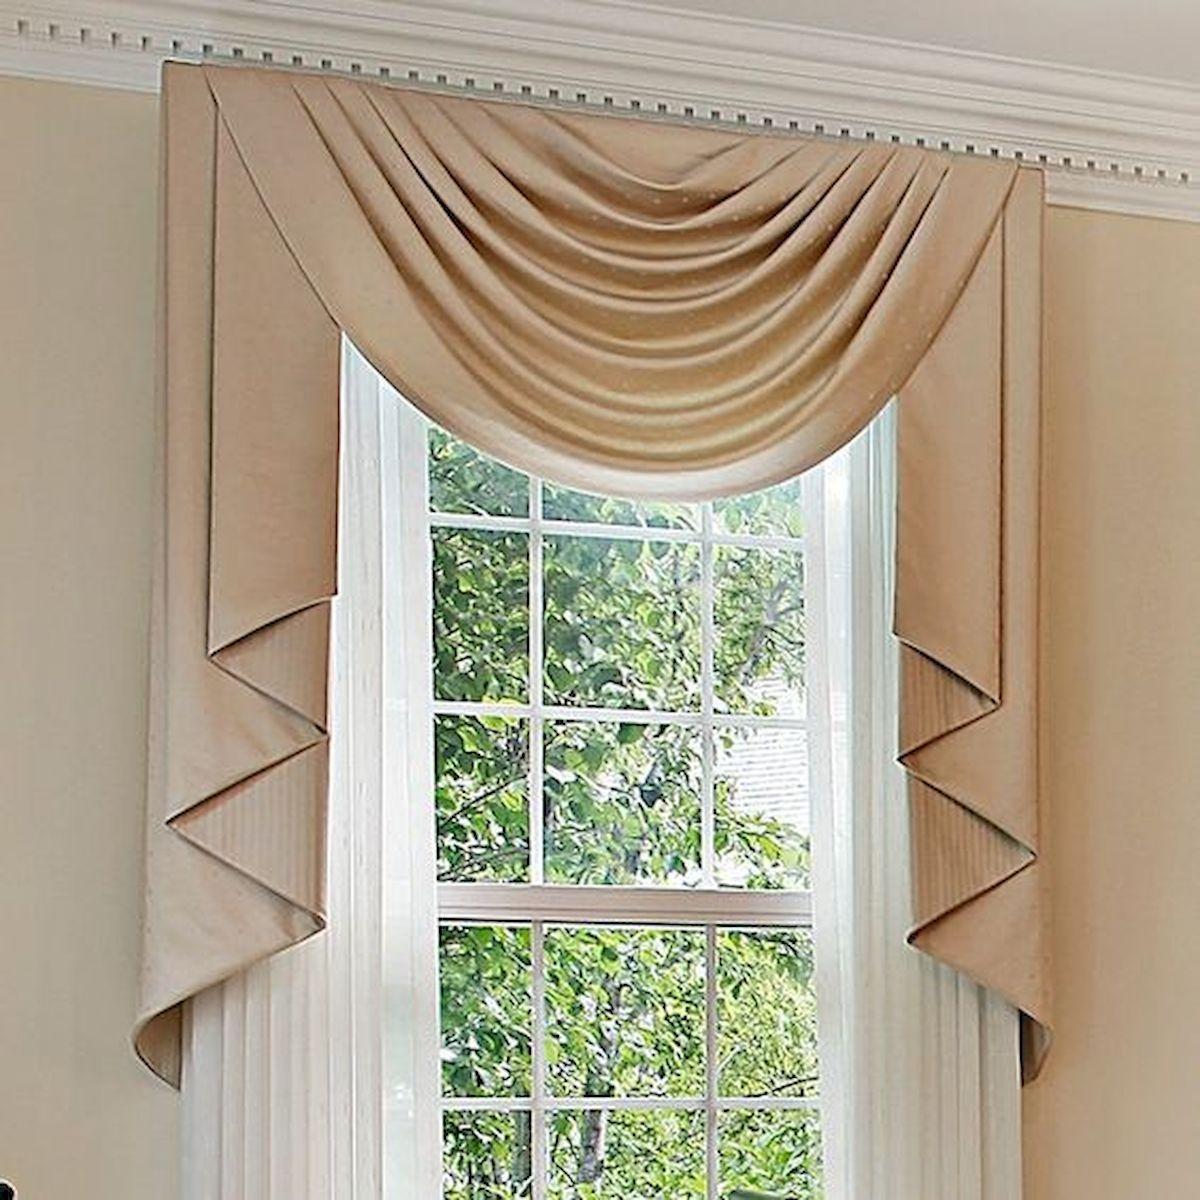 65 Adorable Window Curtains Design Ideas And Decor Cortinas Elegantes Para Sala Cortinas Blancas Cenefas Para Cortinas